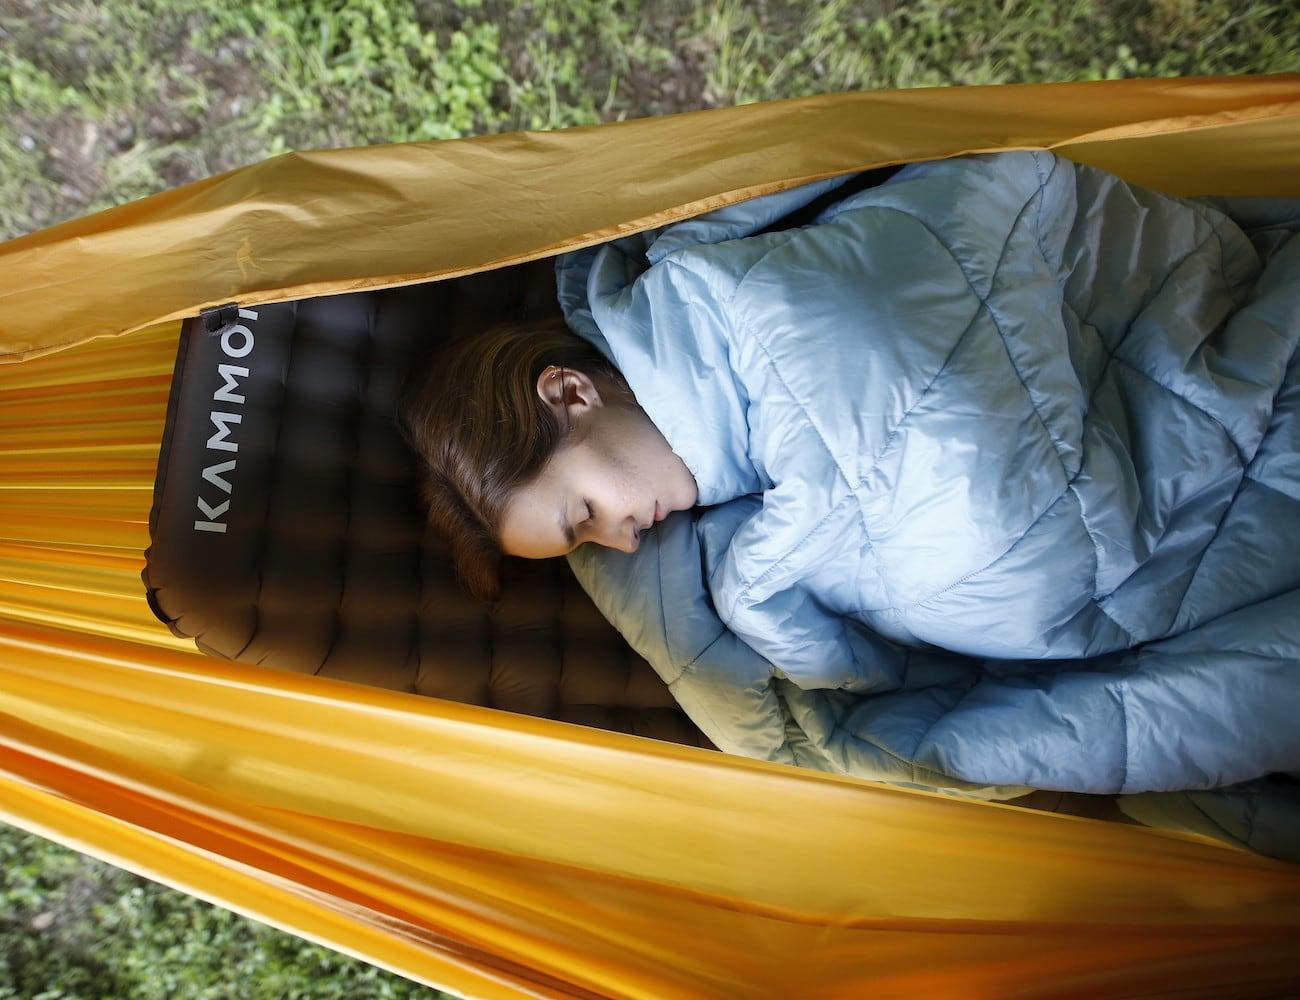 Kammok Pongo 3-Inch Inflatable Sleeping Pad helps you sleep comfortably while camping